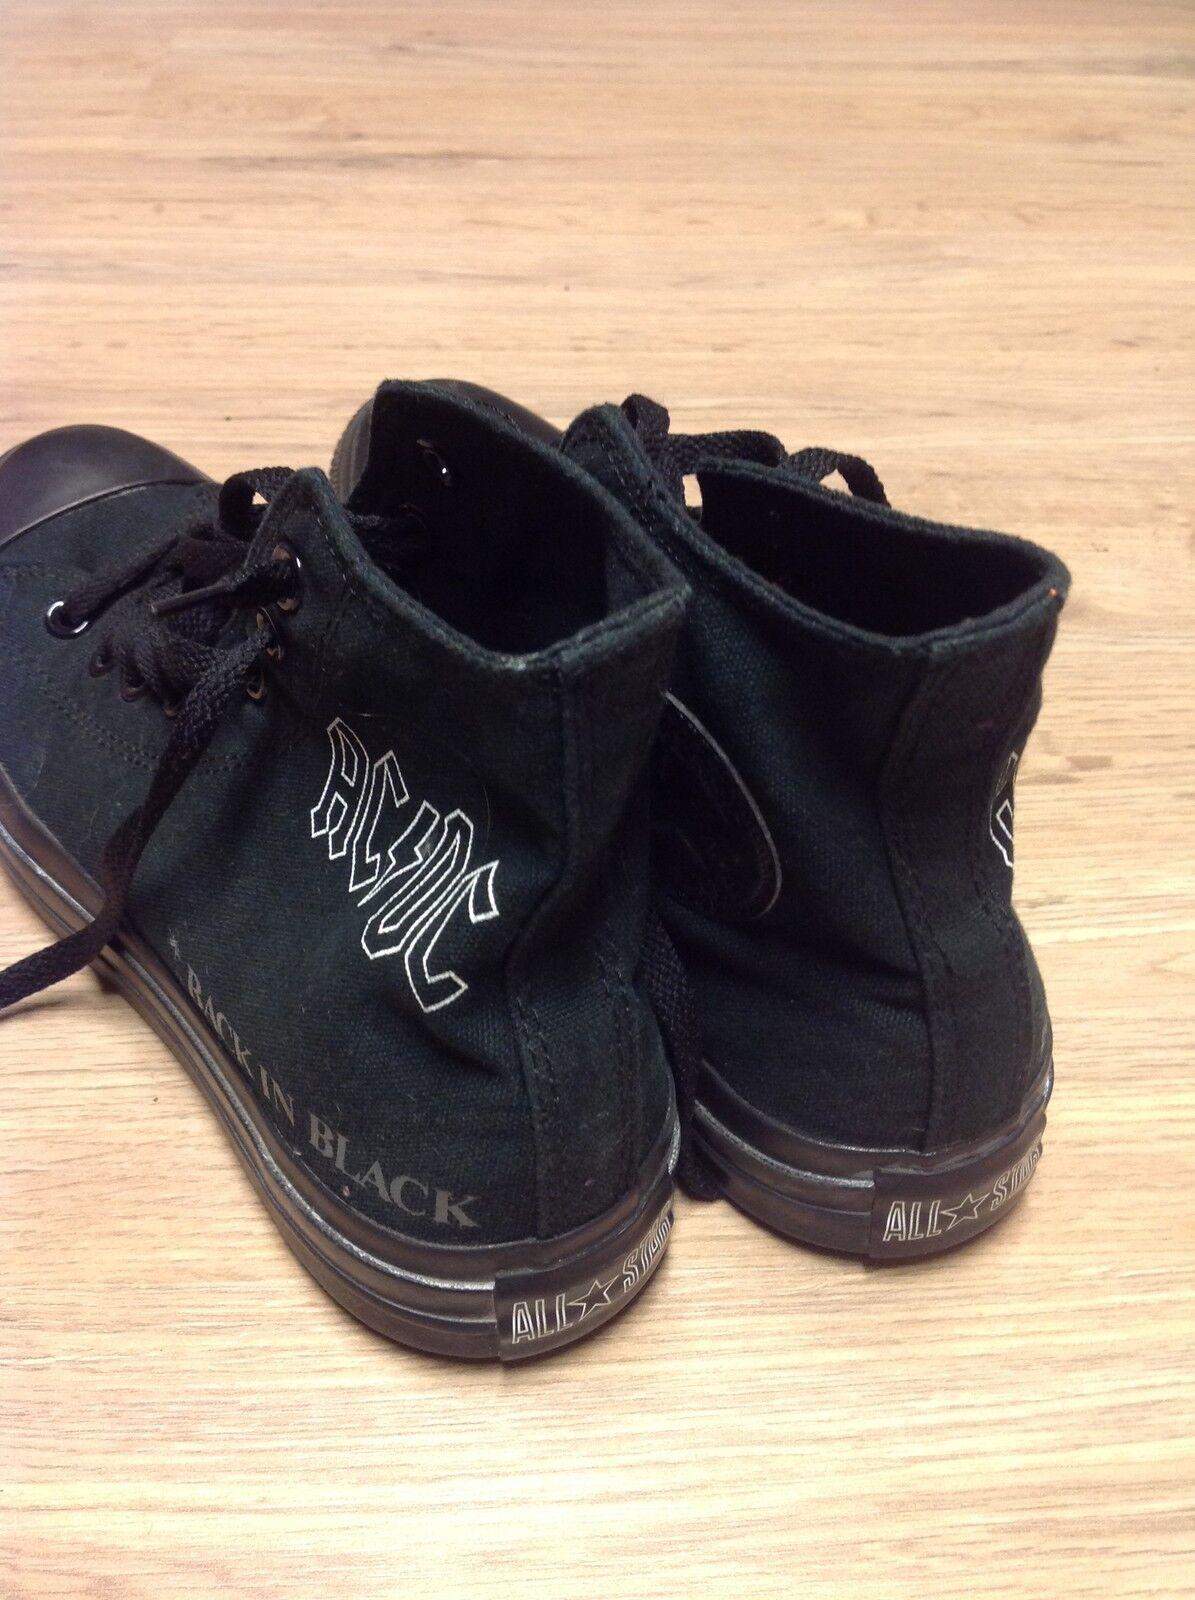 converse chucks ALL STAR AC/DC back in black schwarz LIMITED ED  mehrere grössen